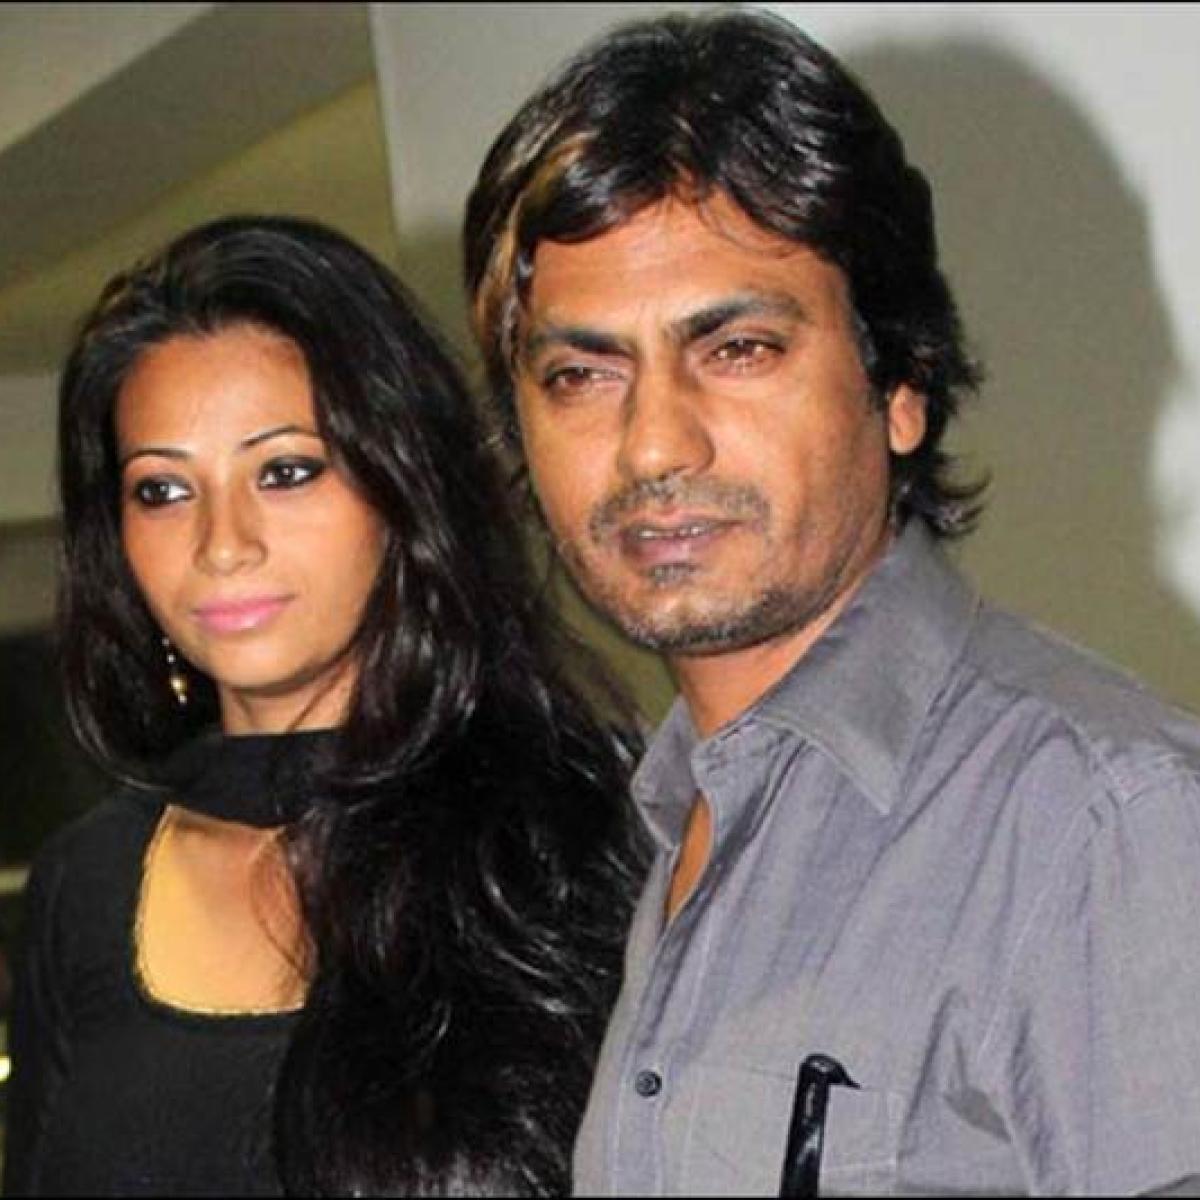 After facing 'serious issues', Nawazuddin Siddiqui's wife Aaliya seeks divorce